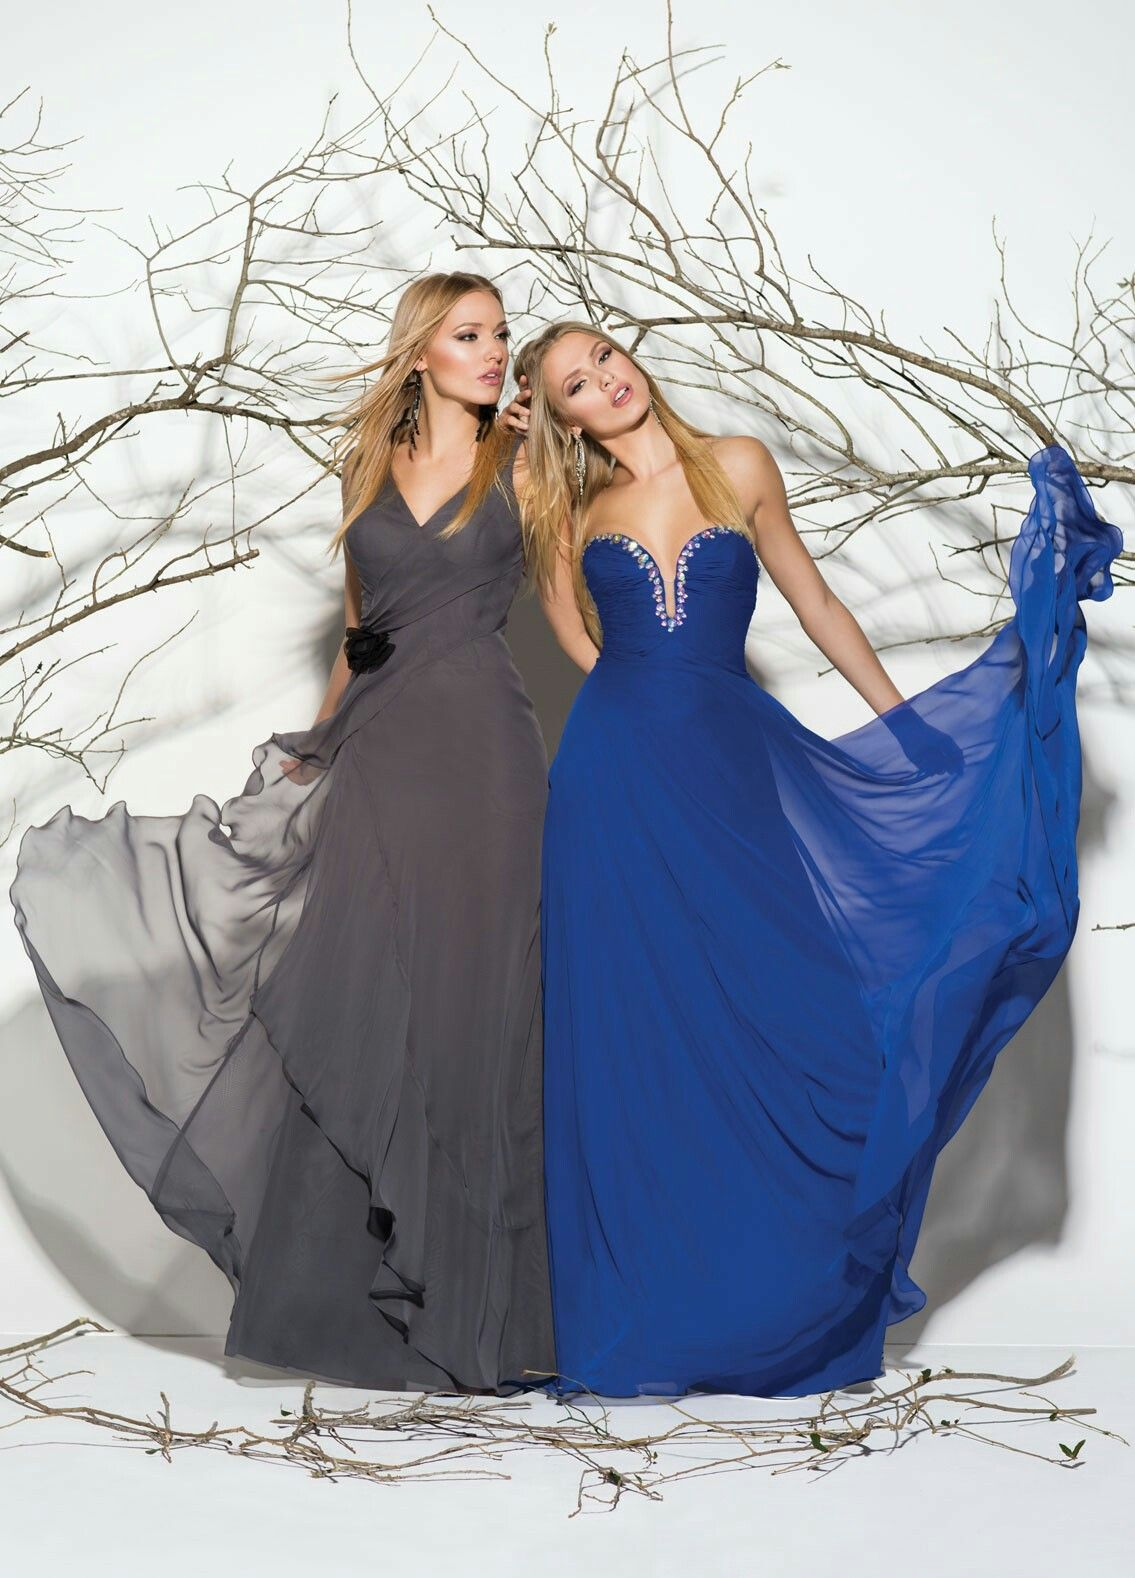 Royal themed wedding dresses  pressionbridal  Bridesmaids  Pinterest